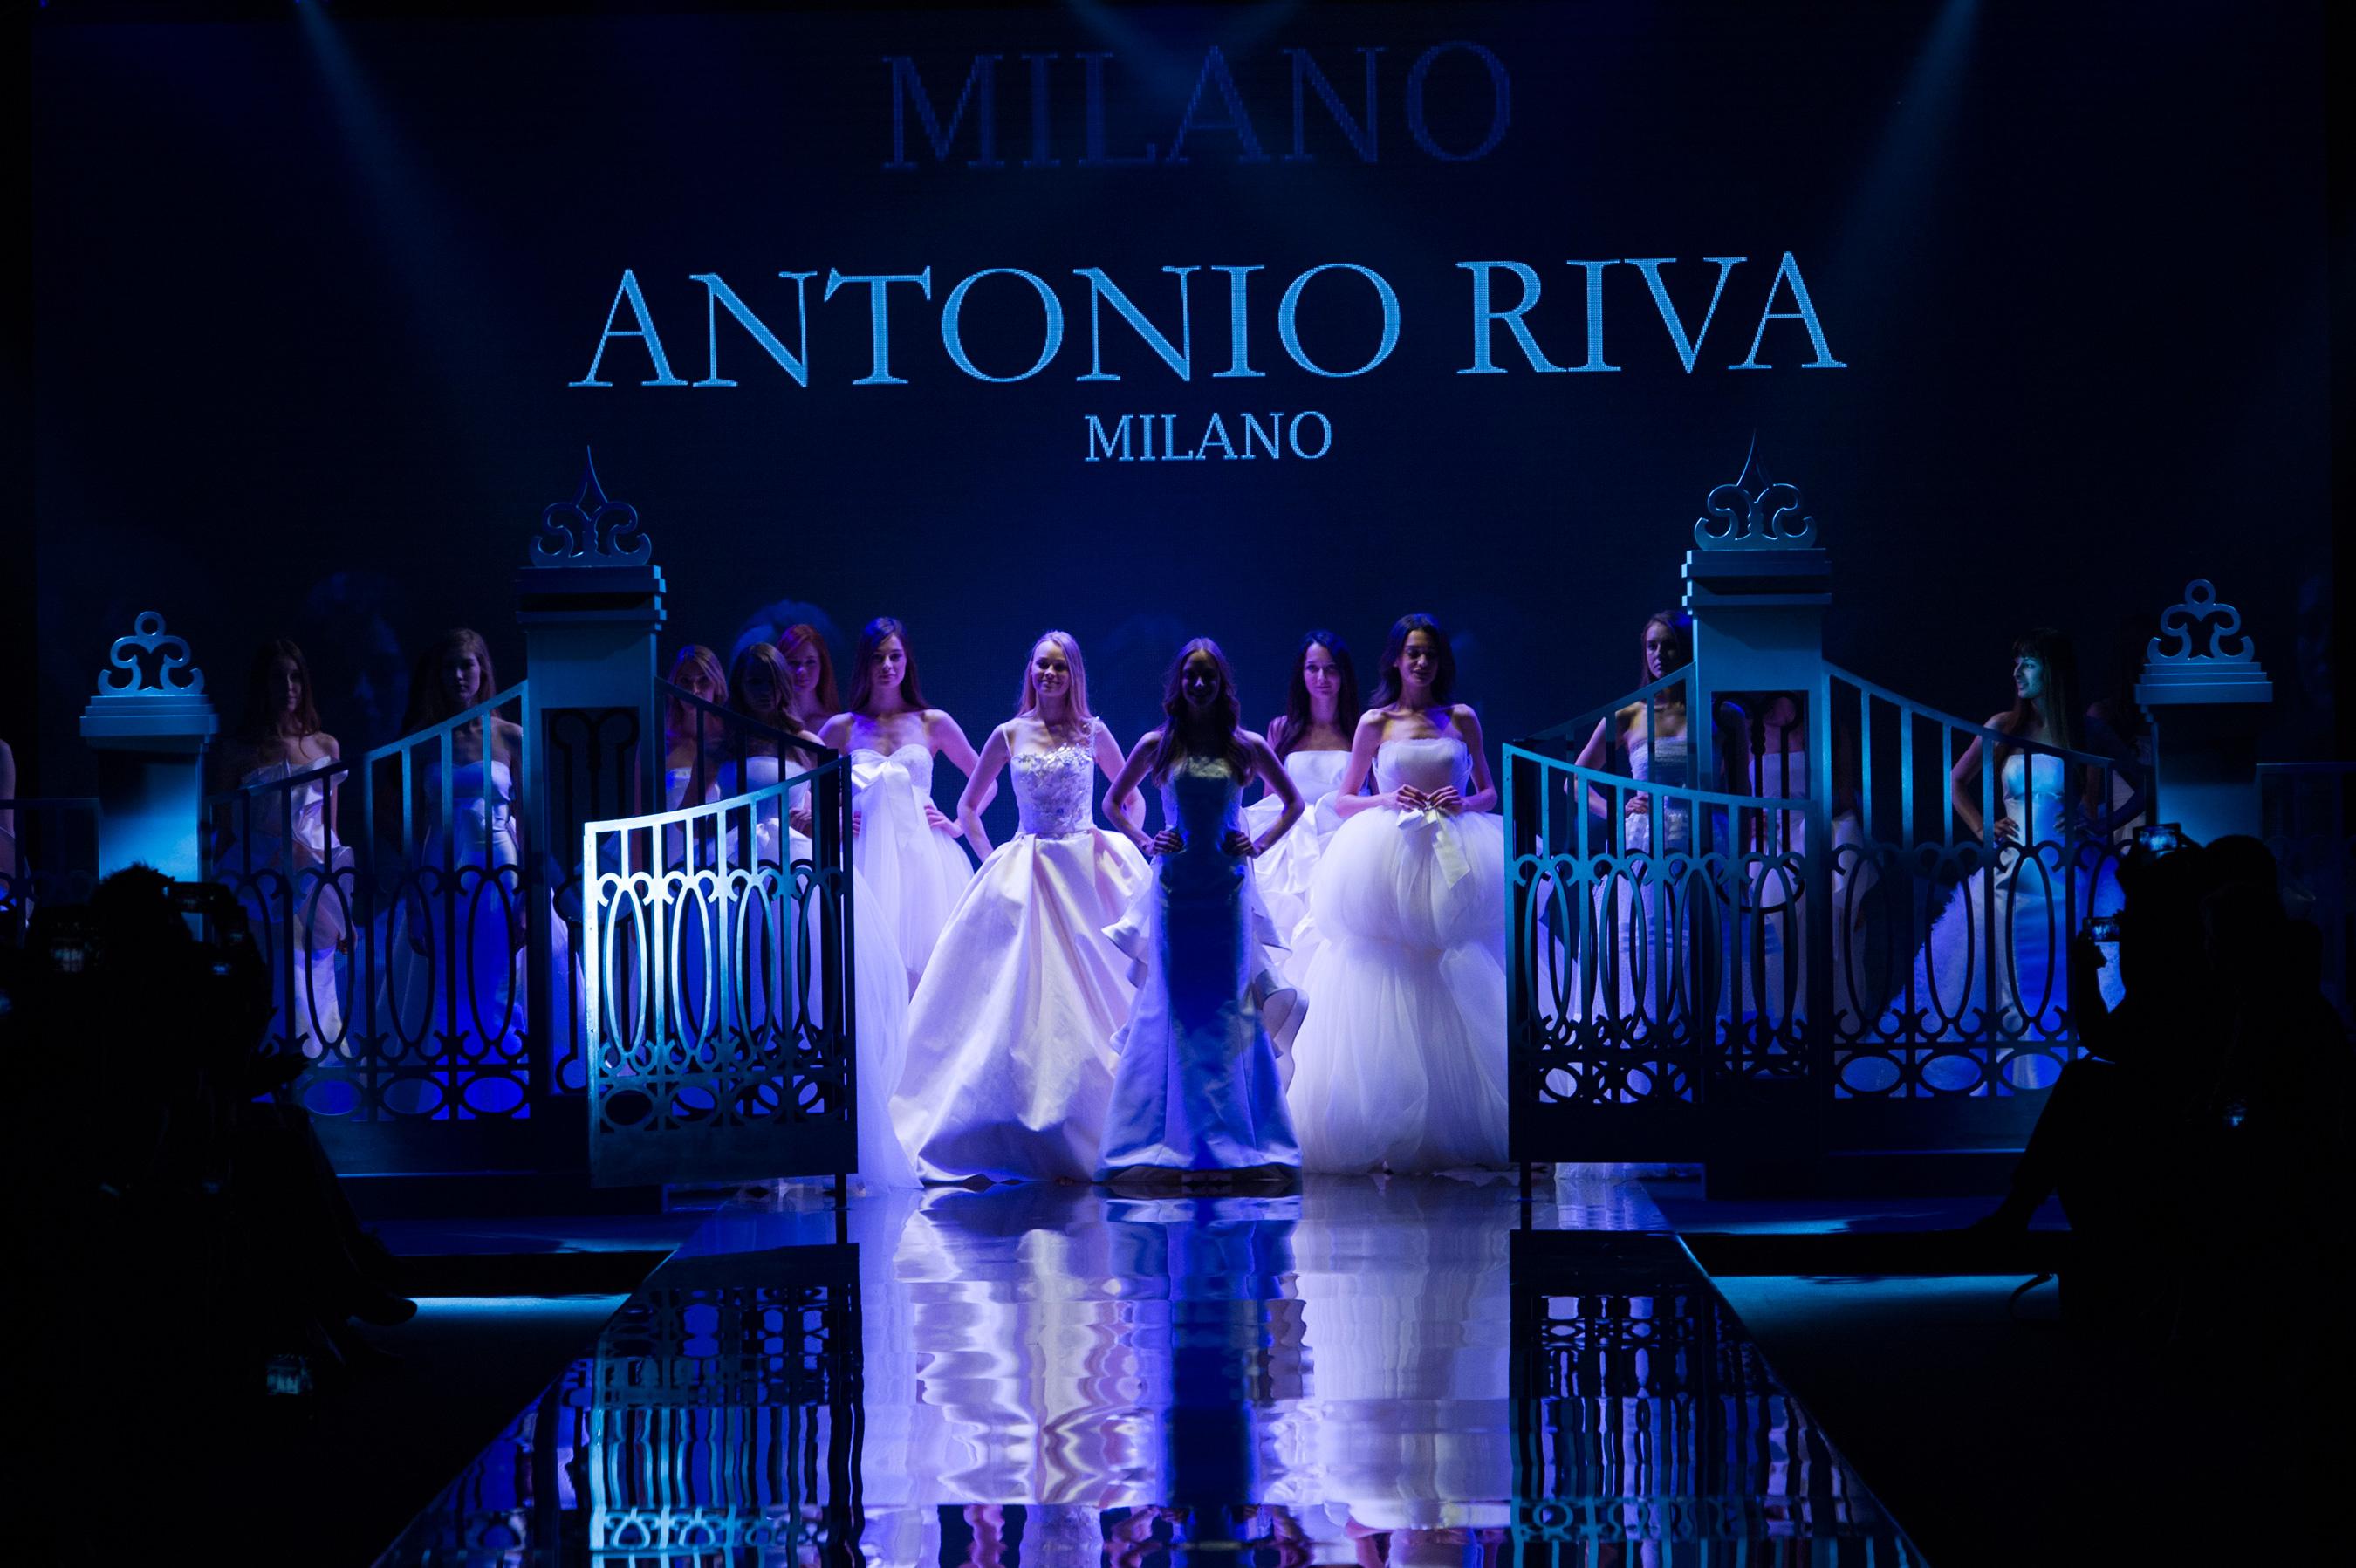 Antonio Riva brd RS17 0553